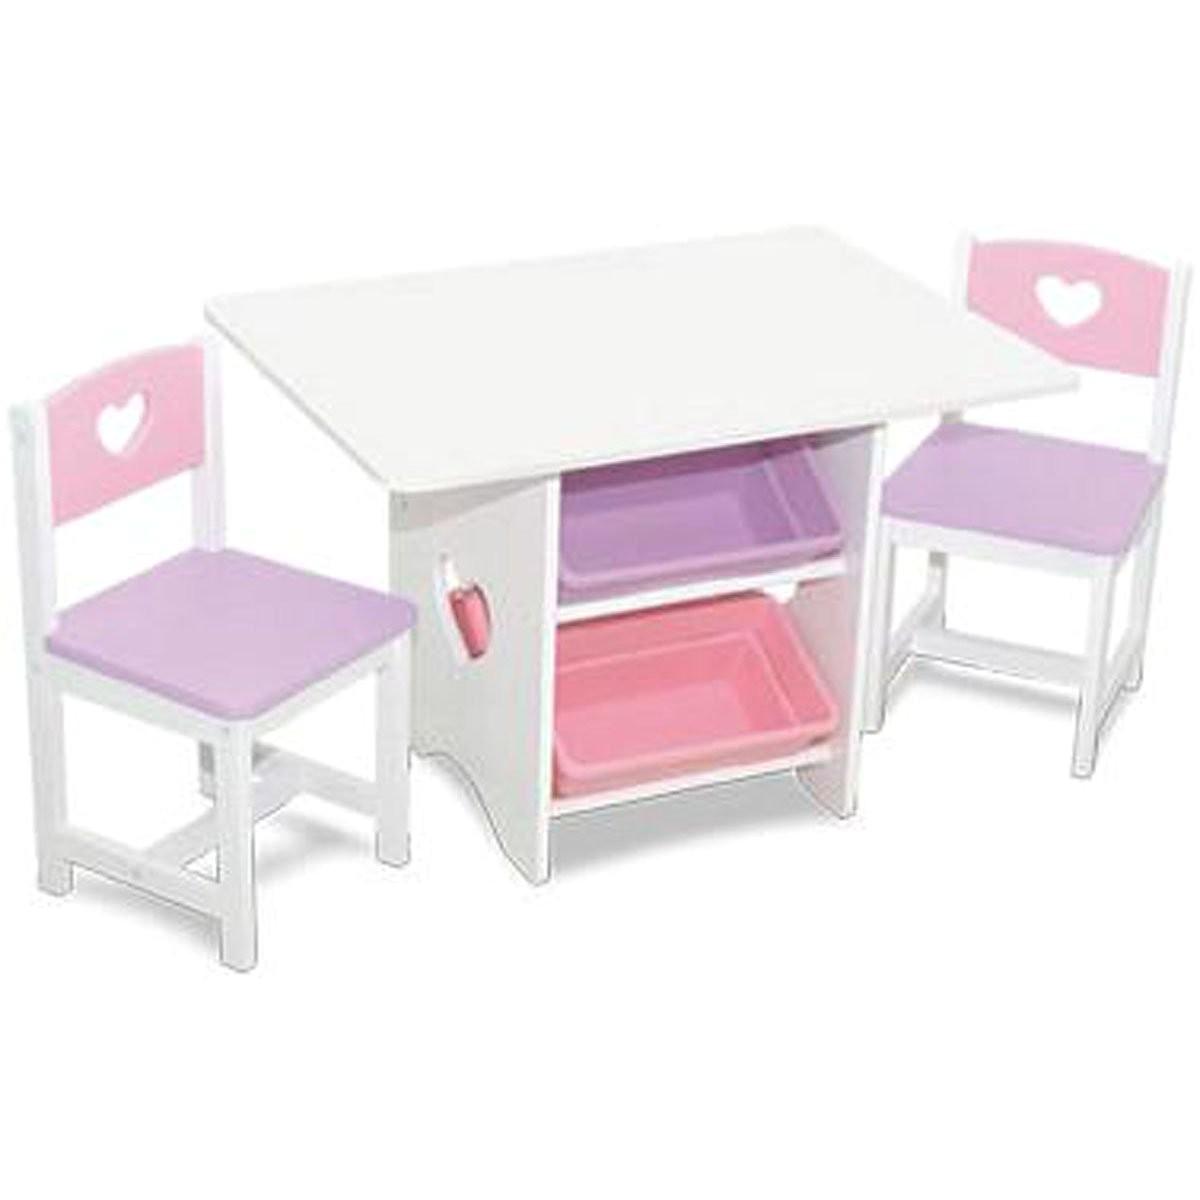 heart table chairs w storage bins